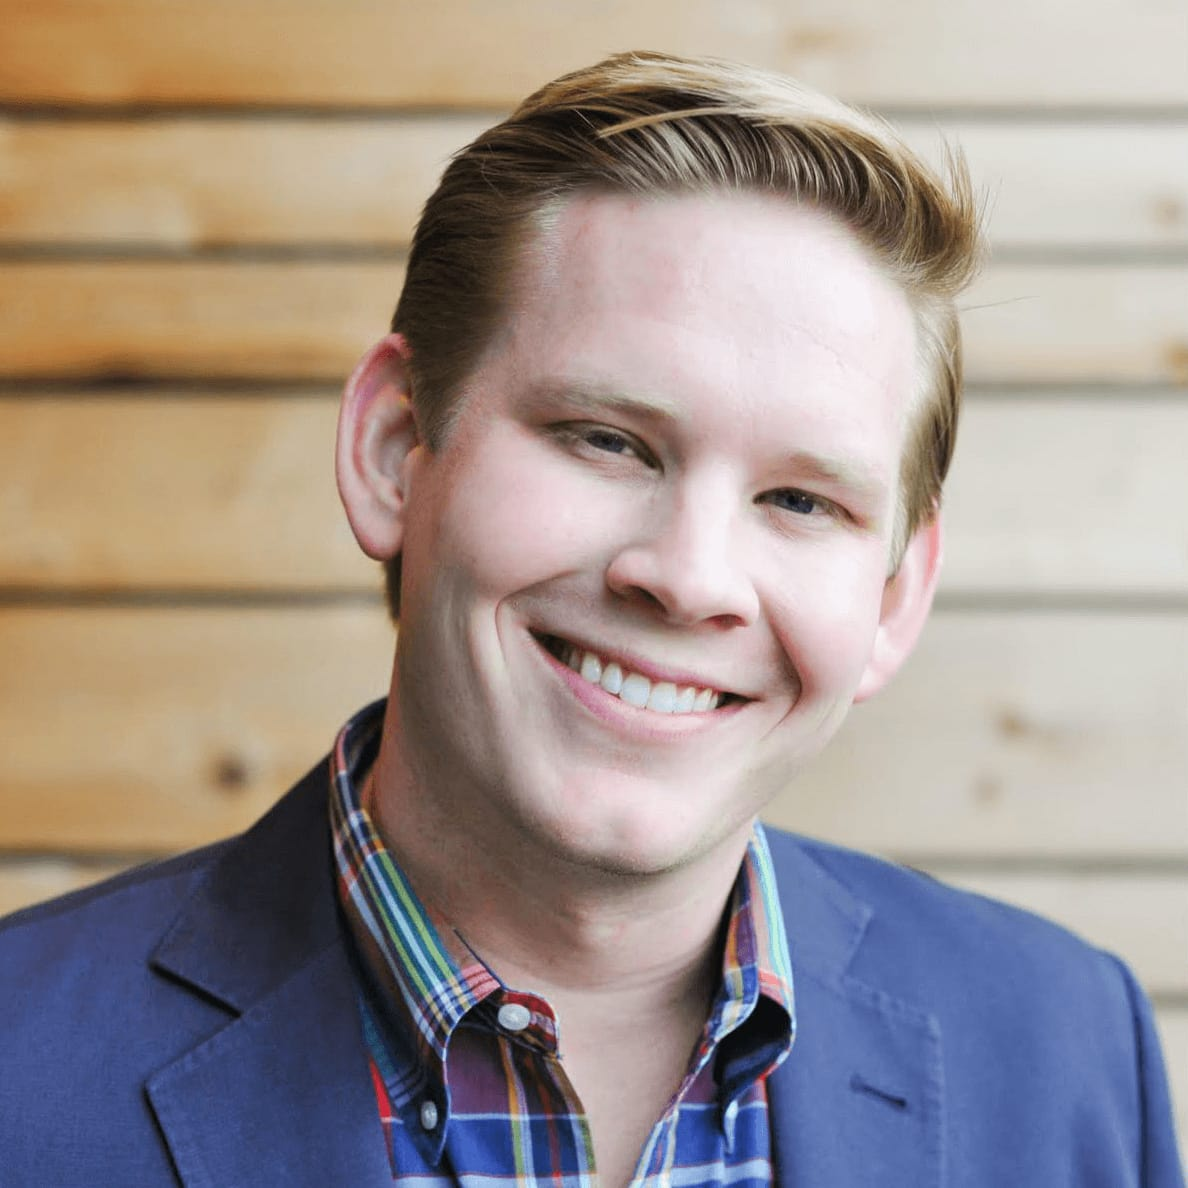 Adam Jacoby of Austin's Jacoby's Restaurant & Mercantile